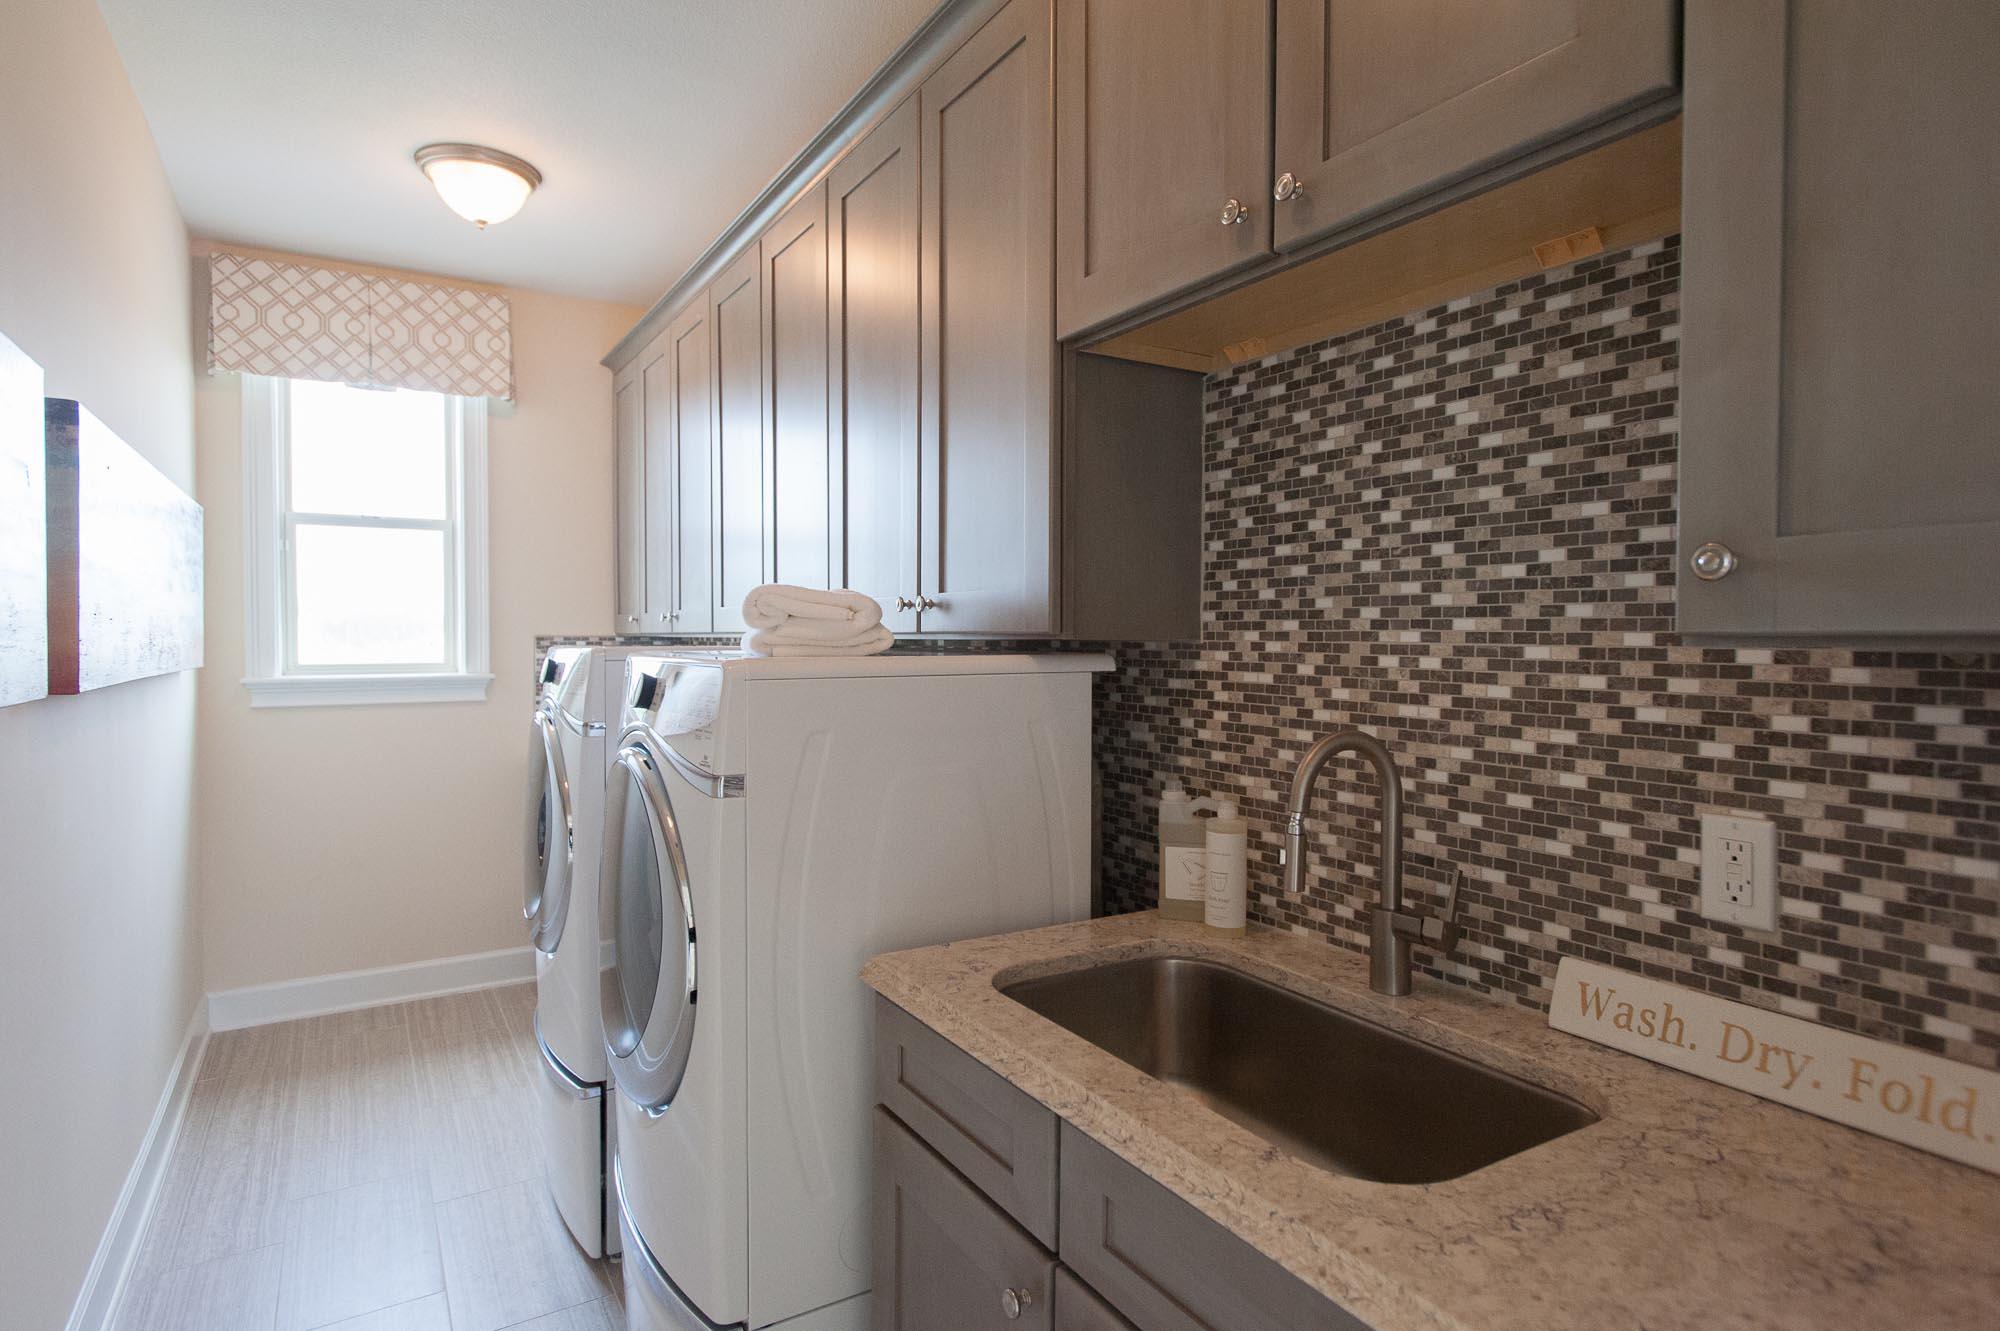 sterling-lennar-celestina-st johns-florida-nefba-northeast florida-southeastern united states-residential interior design-contemporary-transitional-washer-dryer-laundry room.jpg